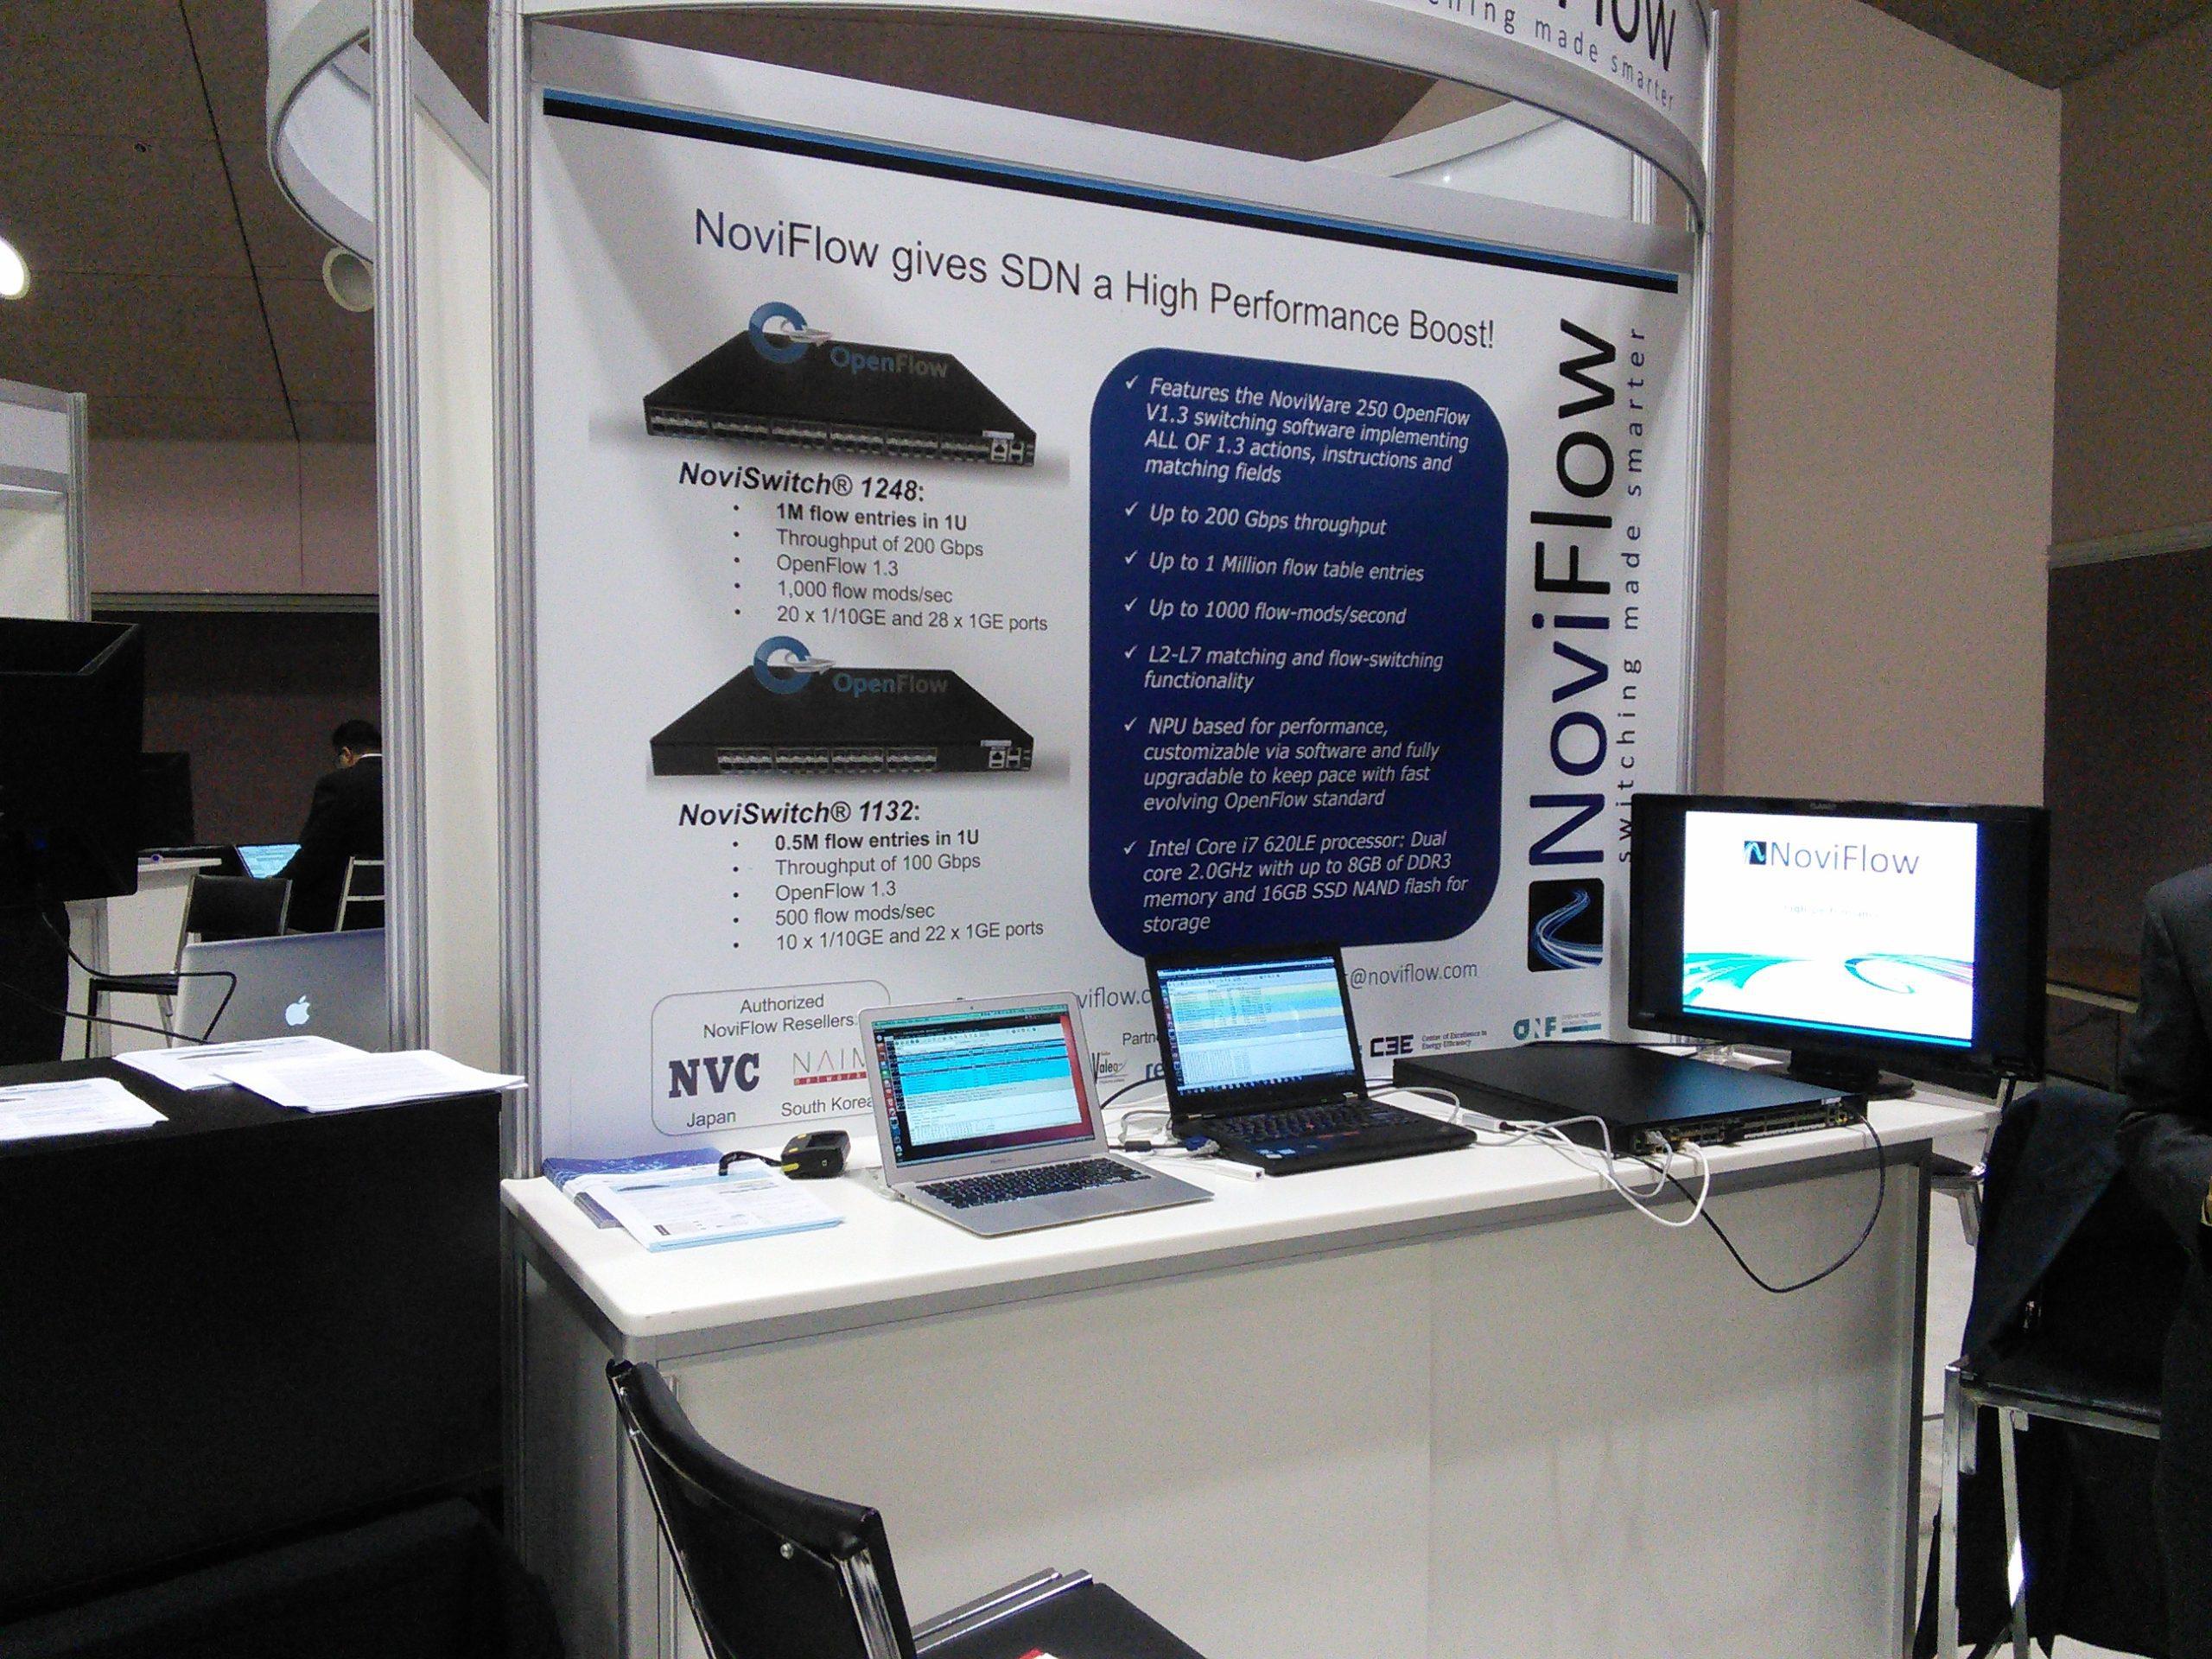 NoviFlow at ONS 2014